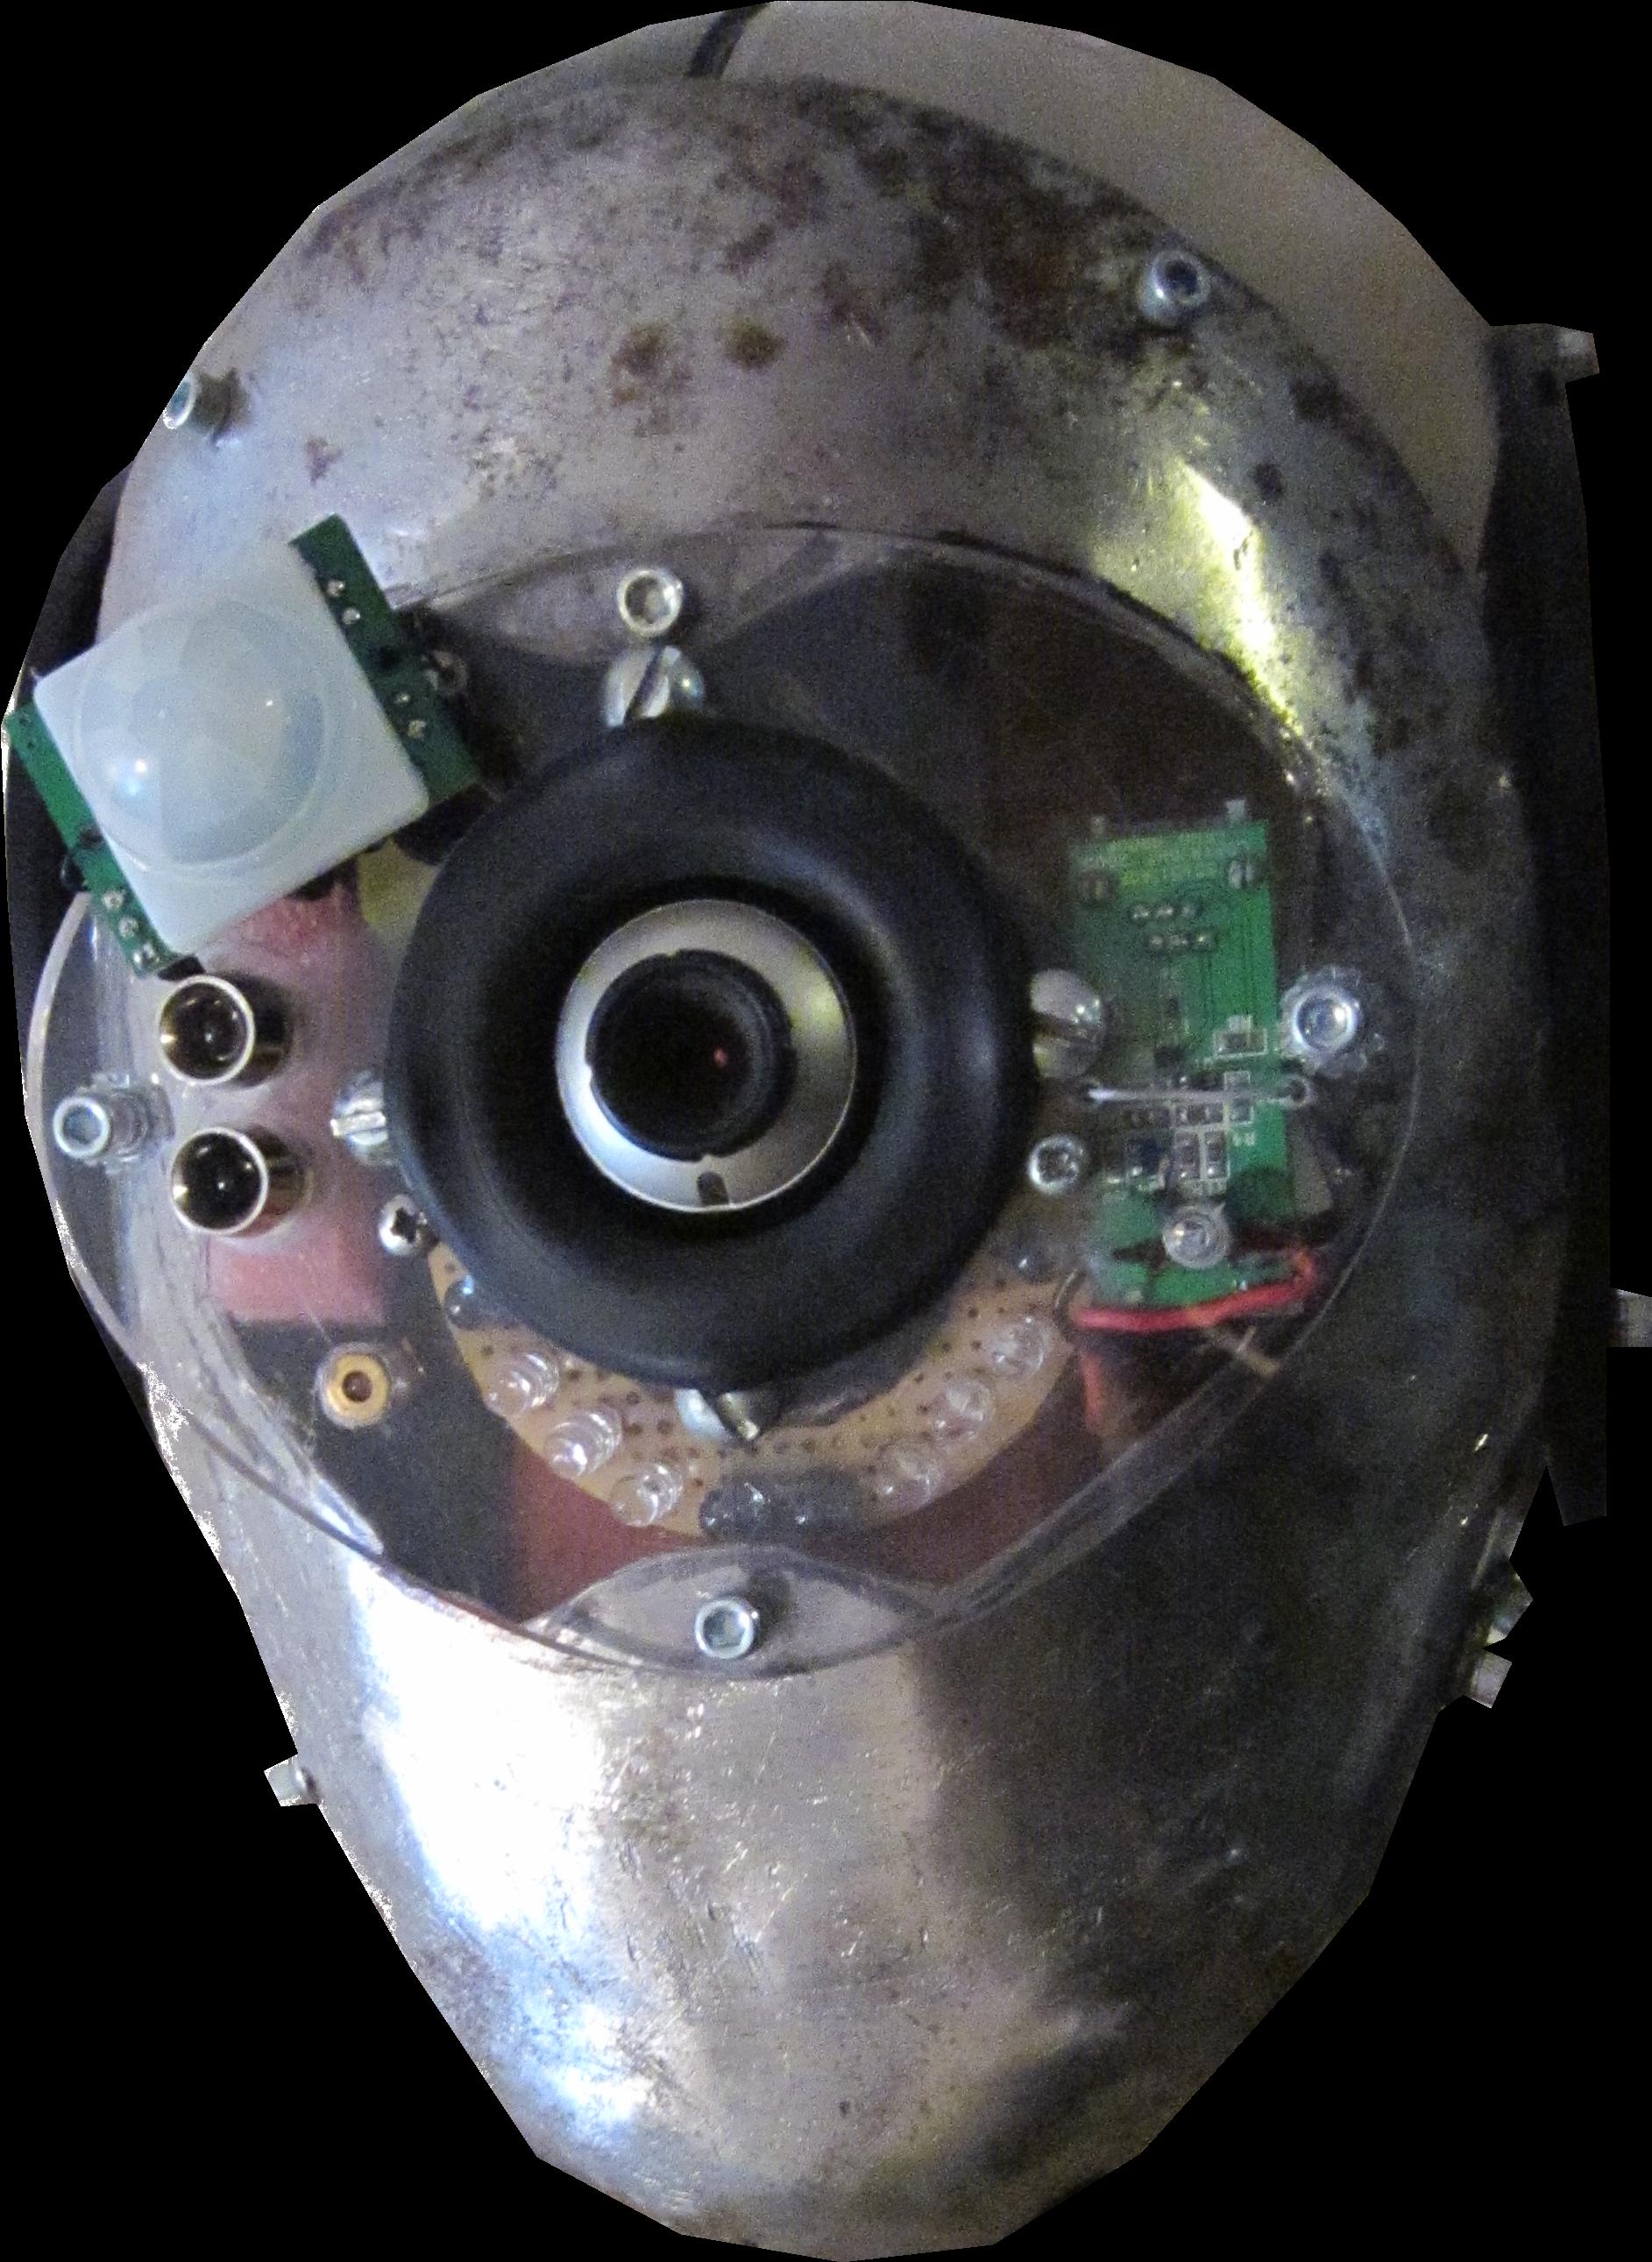 Transparent robot head clipart - Robot Head Png - Robot Head Png Transparent